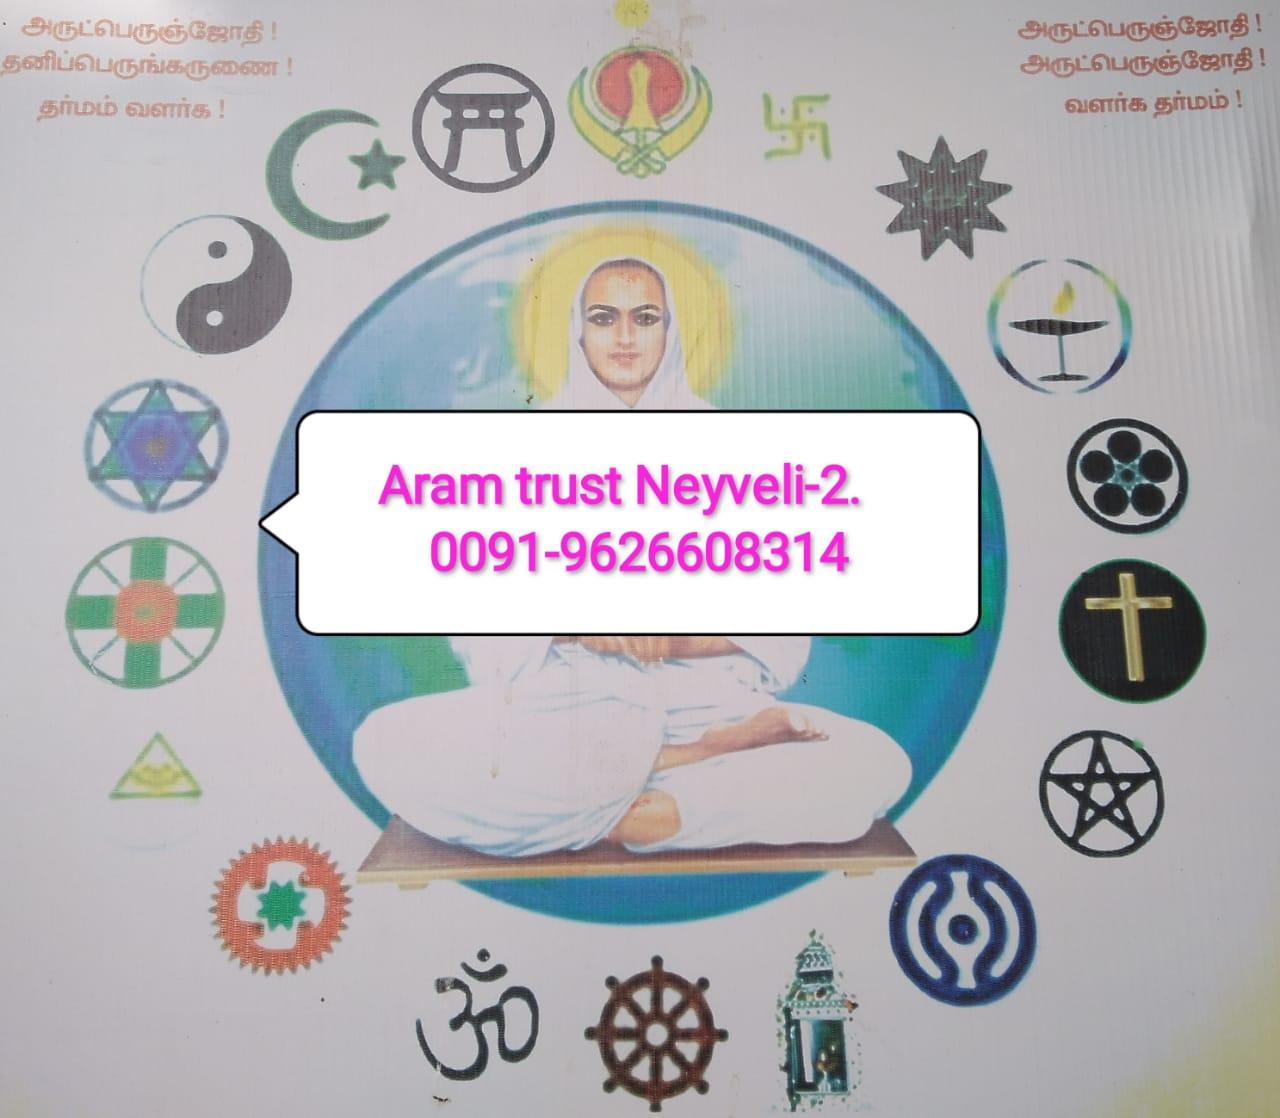 /media/aramtrust/WhatsApp_Image_2020-12-01_at_3.43.29_PM.jpeg